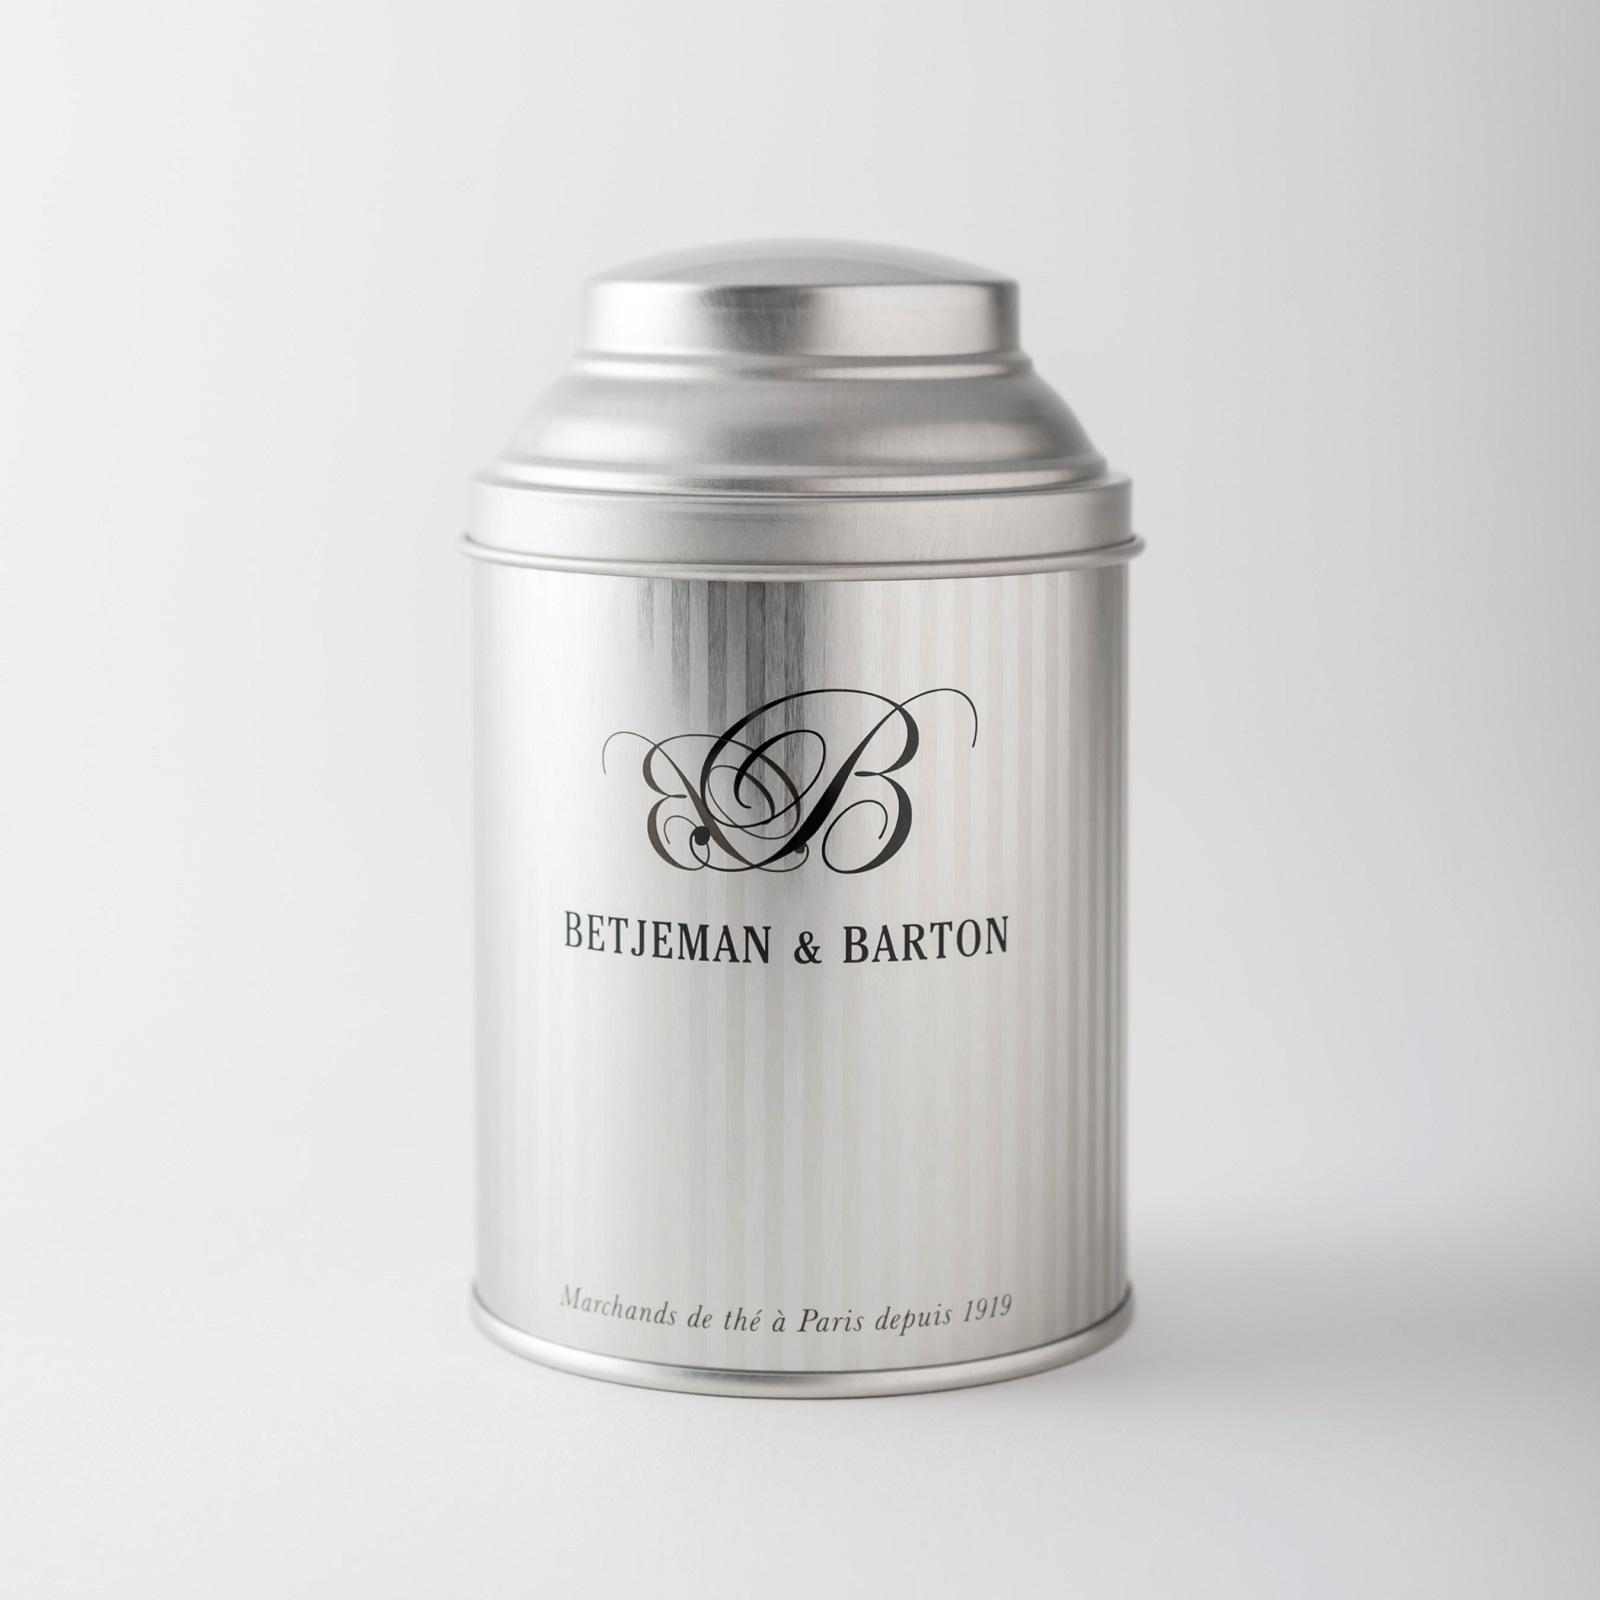 Assam Keelung アッサムキーラング 70g缶